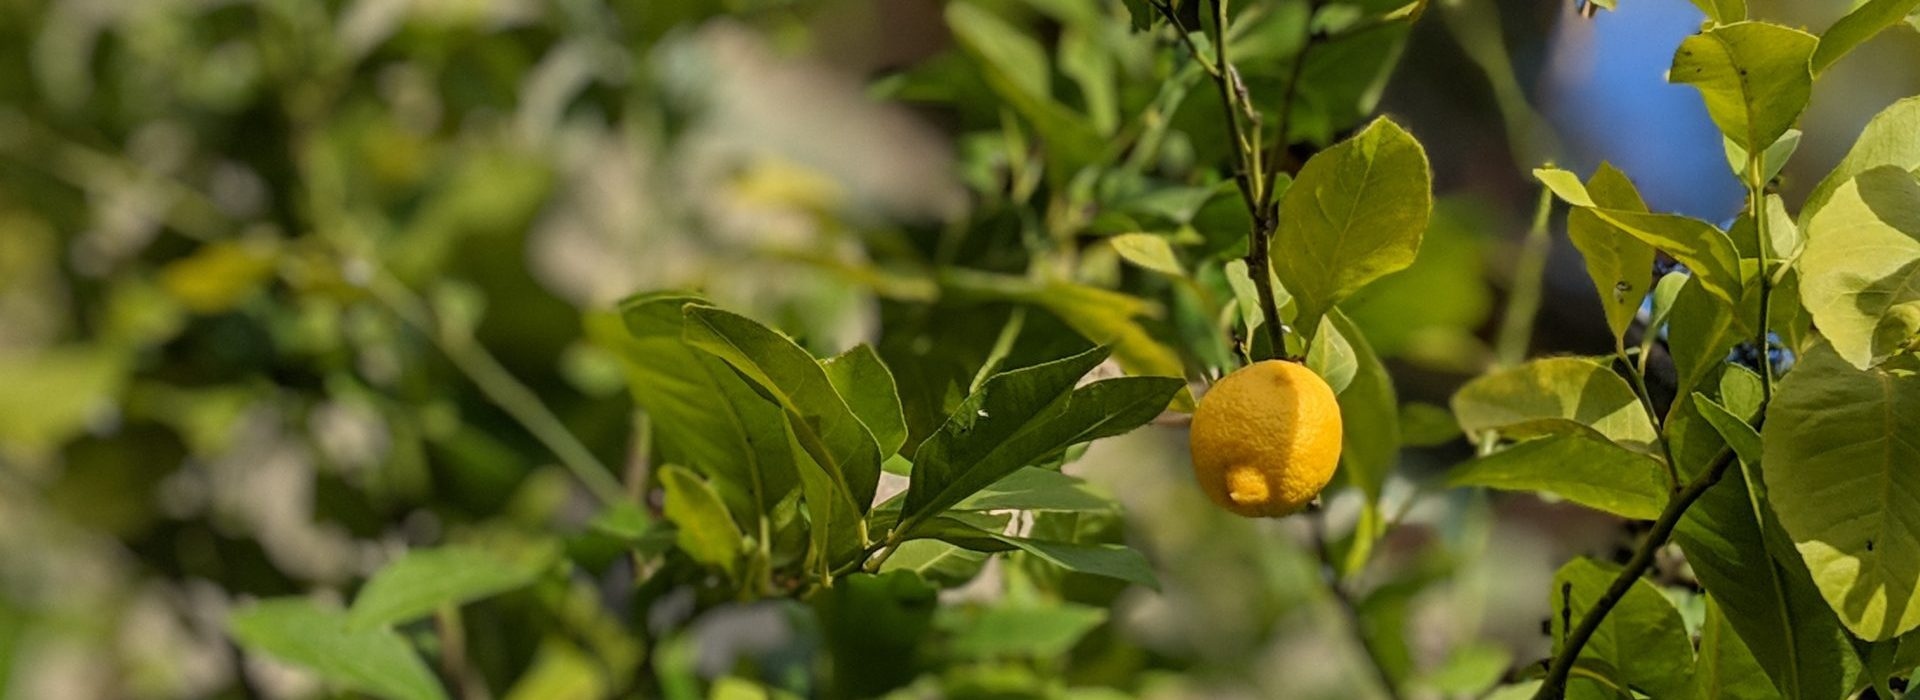 Lemon Trees in Tuscany